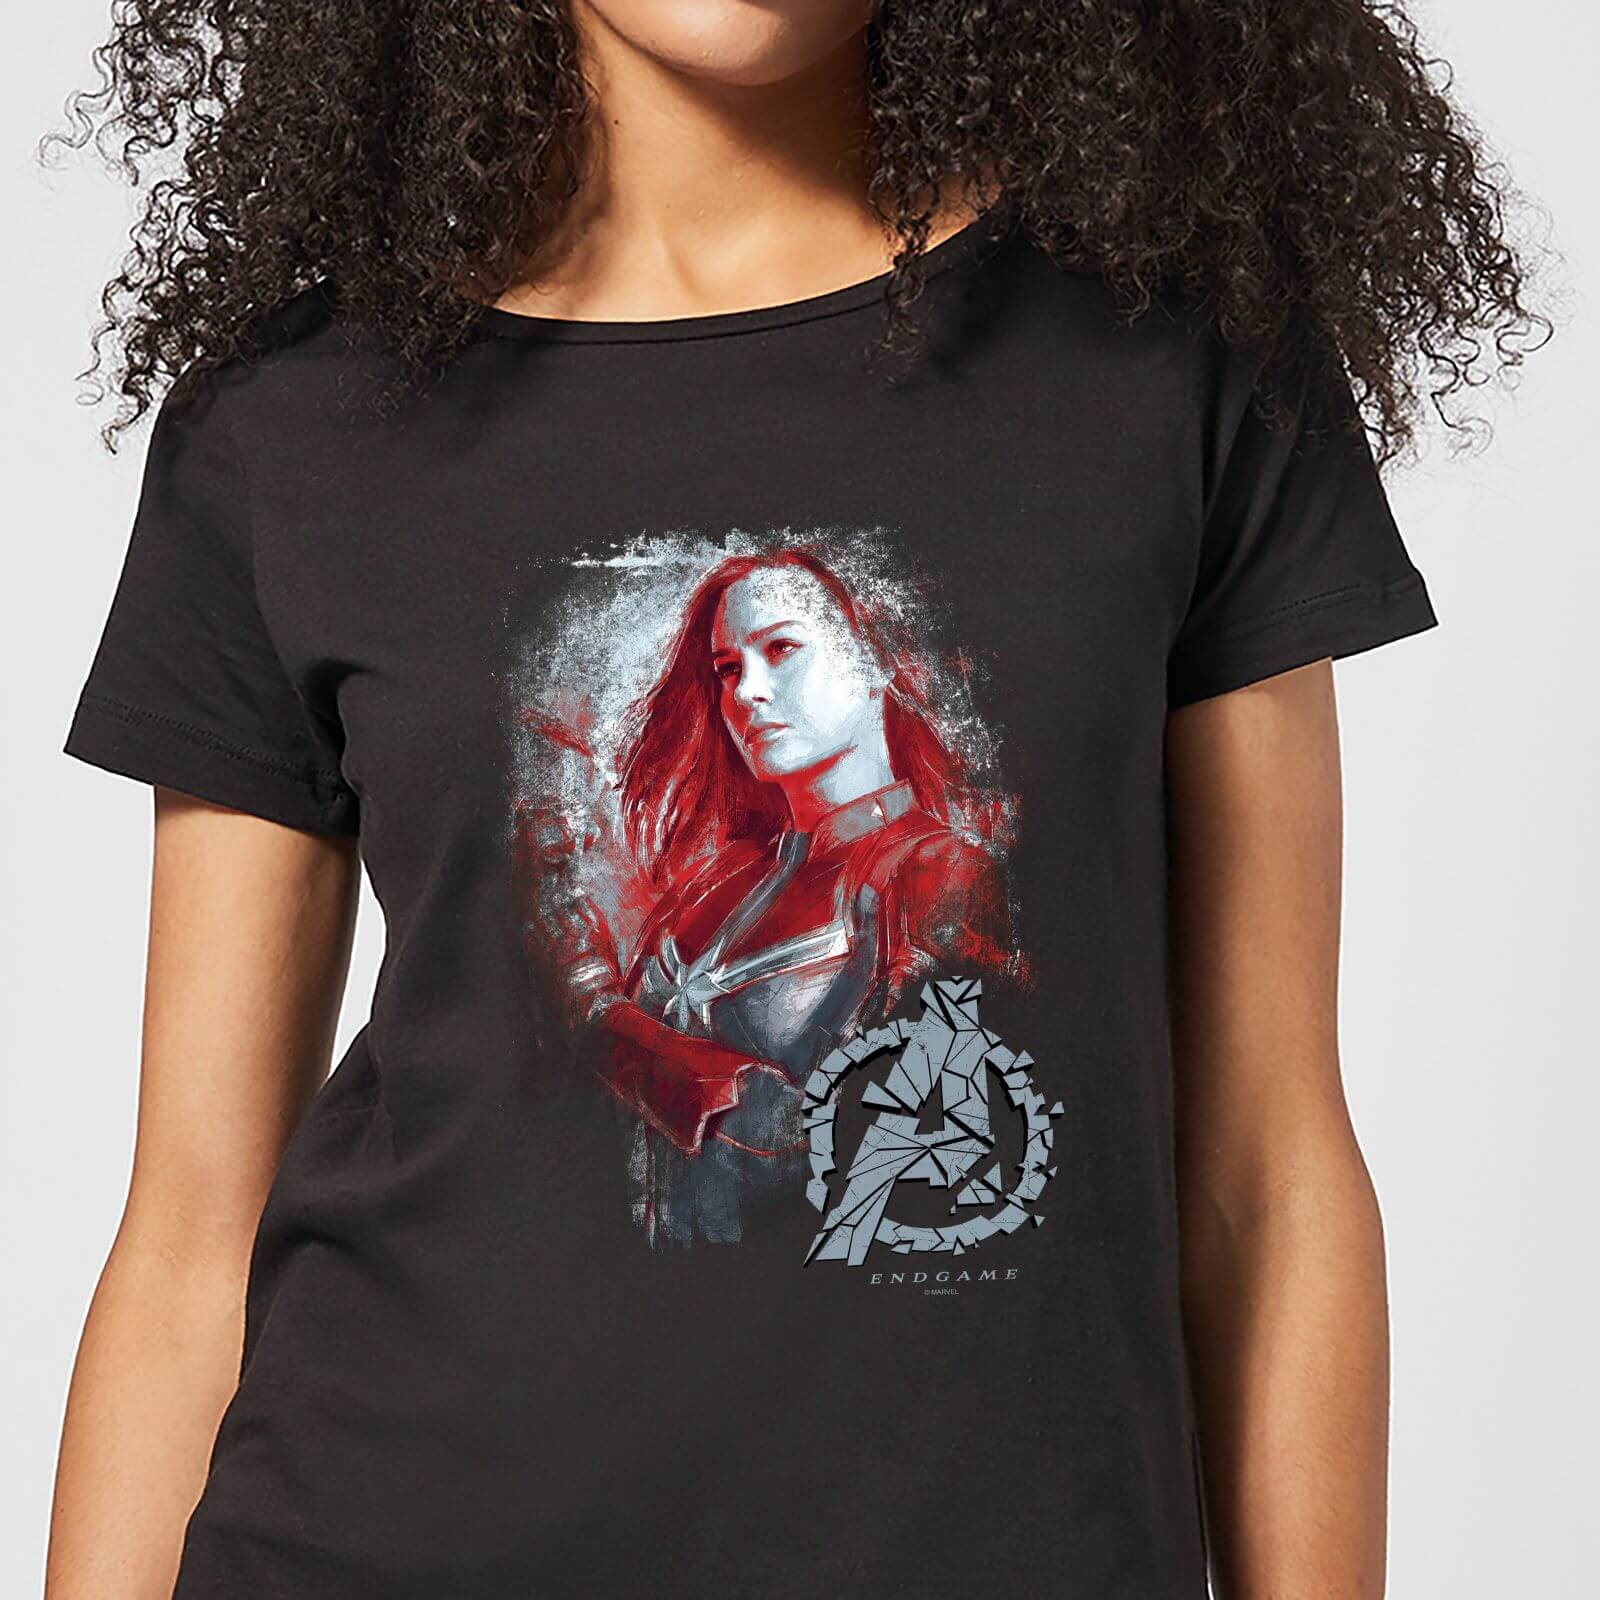 61f5c0bb Avengers Endgame Captain Marvel Brushed Women's T-Shirt - Black Clothing |  Zavvi